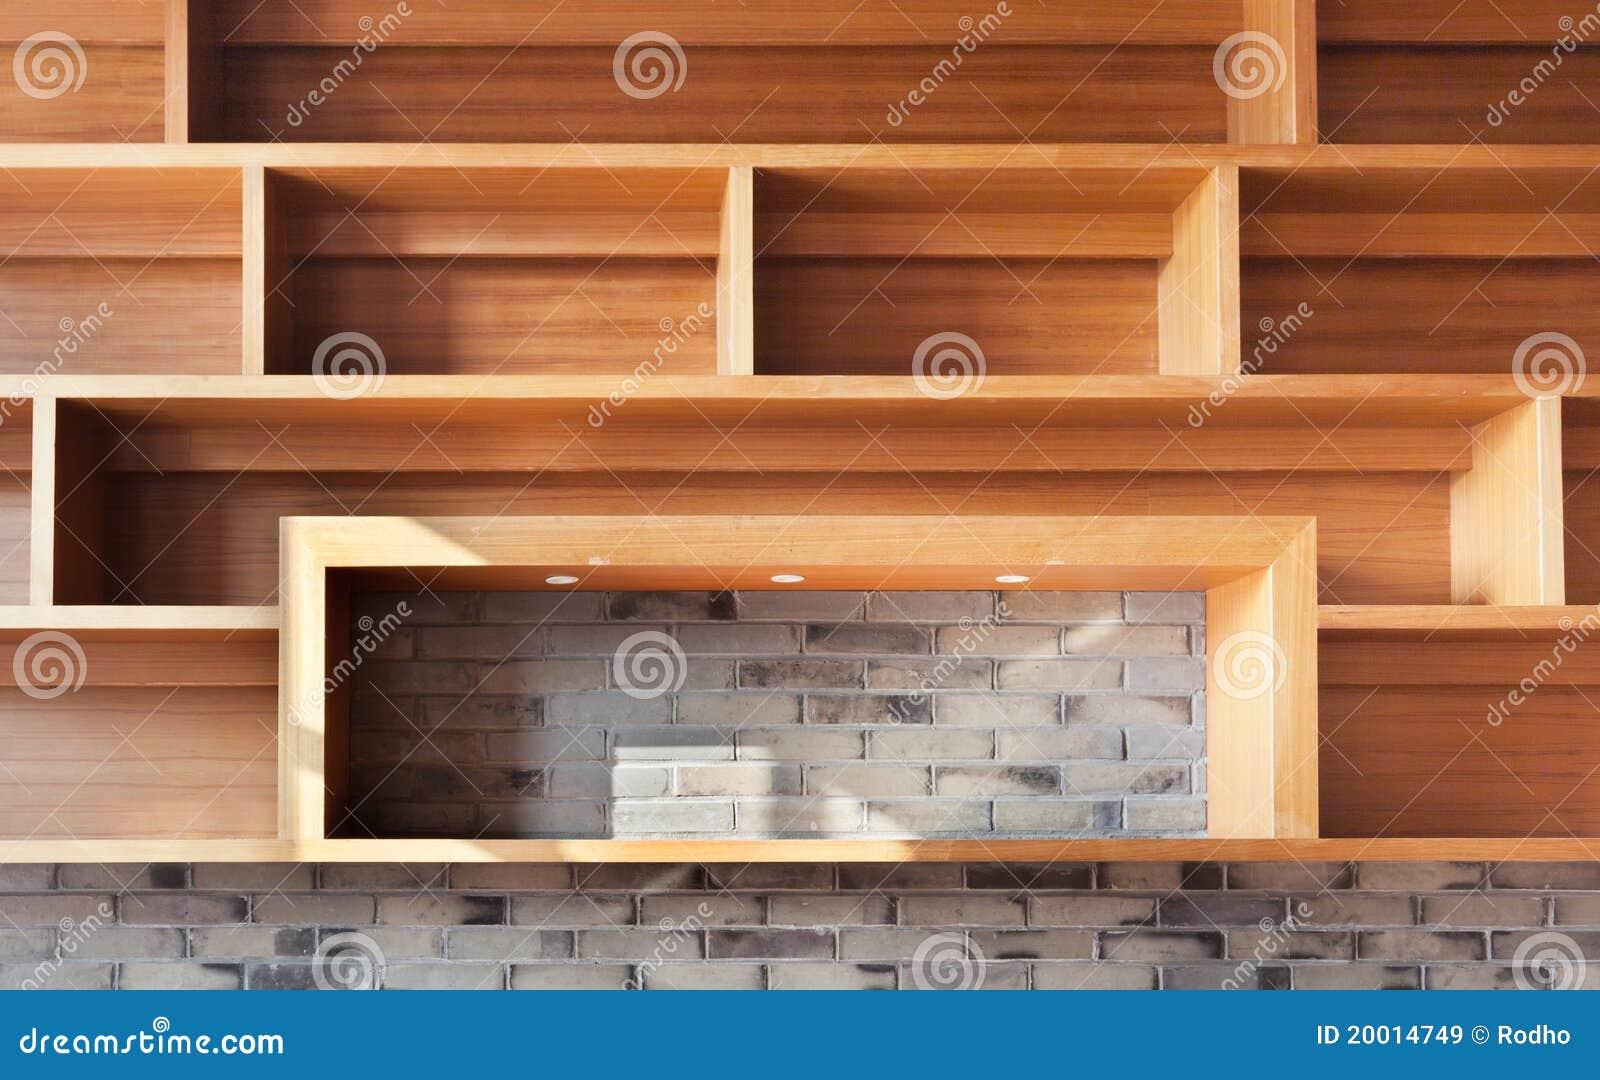 Empty Wood Shelf On Brick Wall Royalty Free Stock Images - Image ...